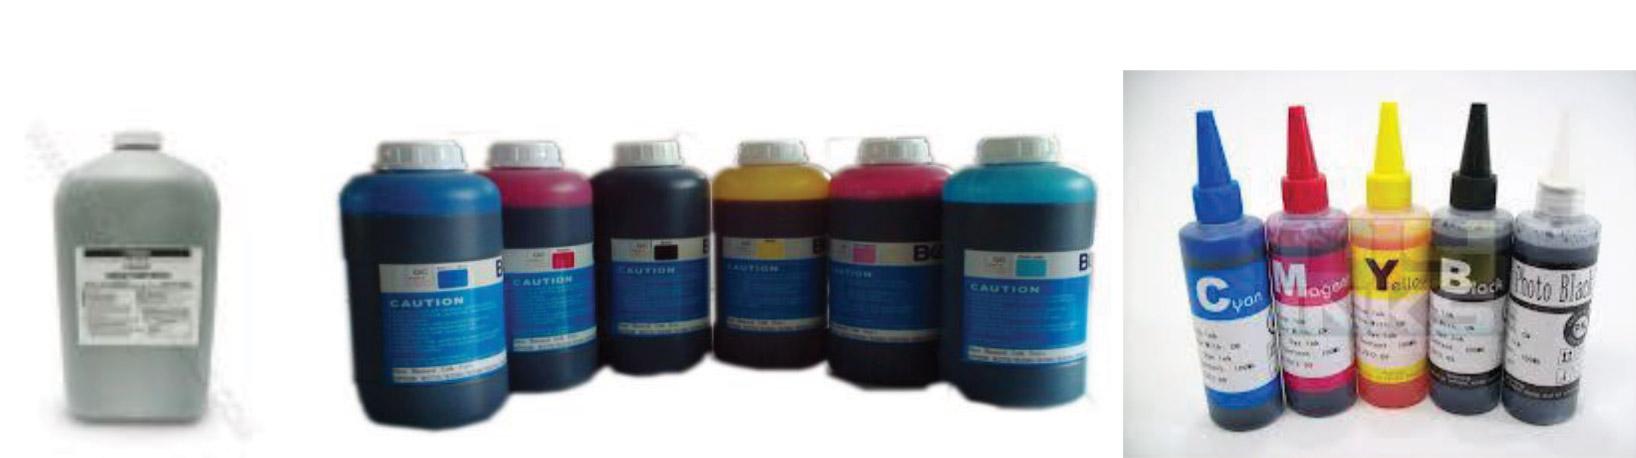 liquid-ink-tubes-bottles-and-jugs